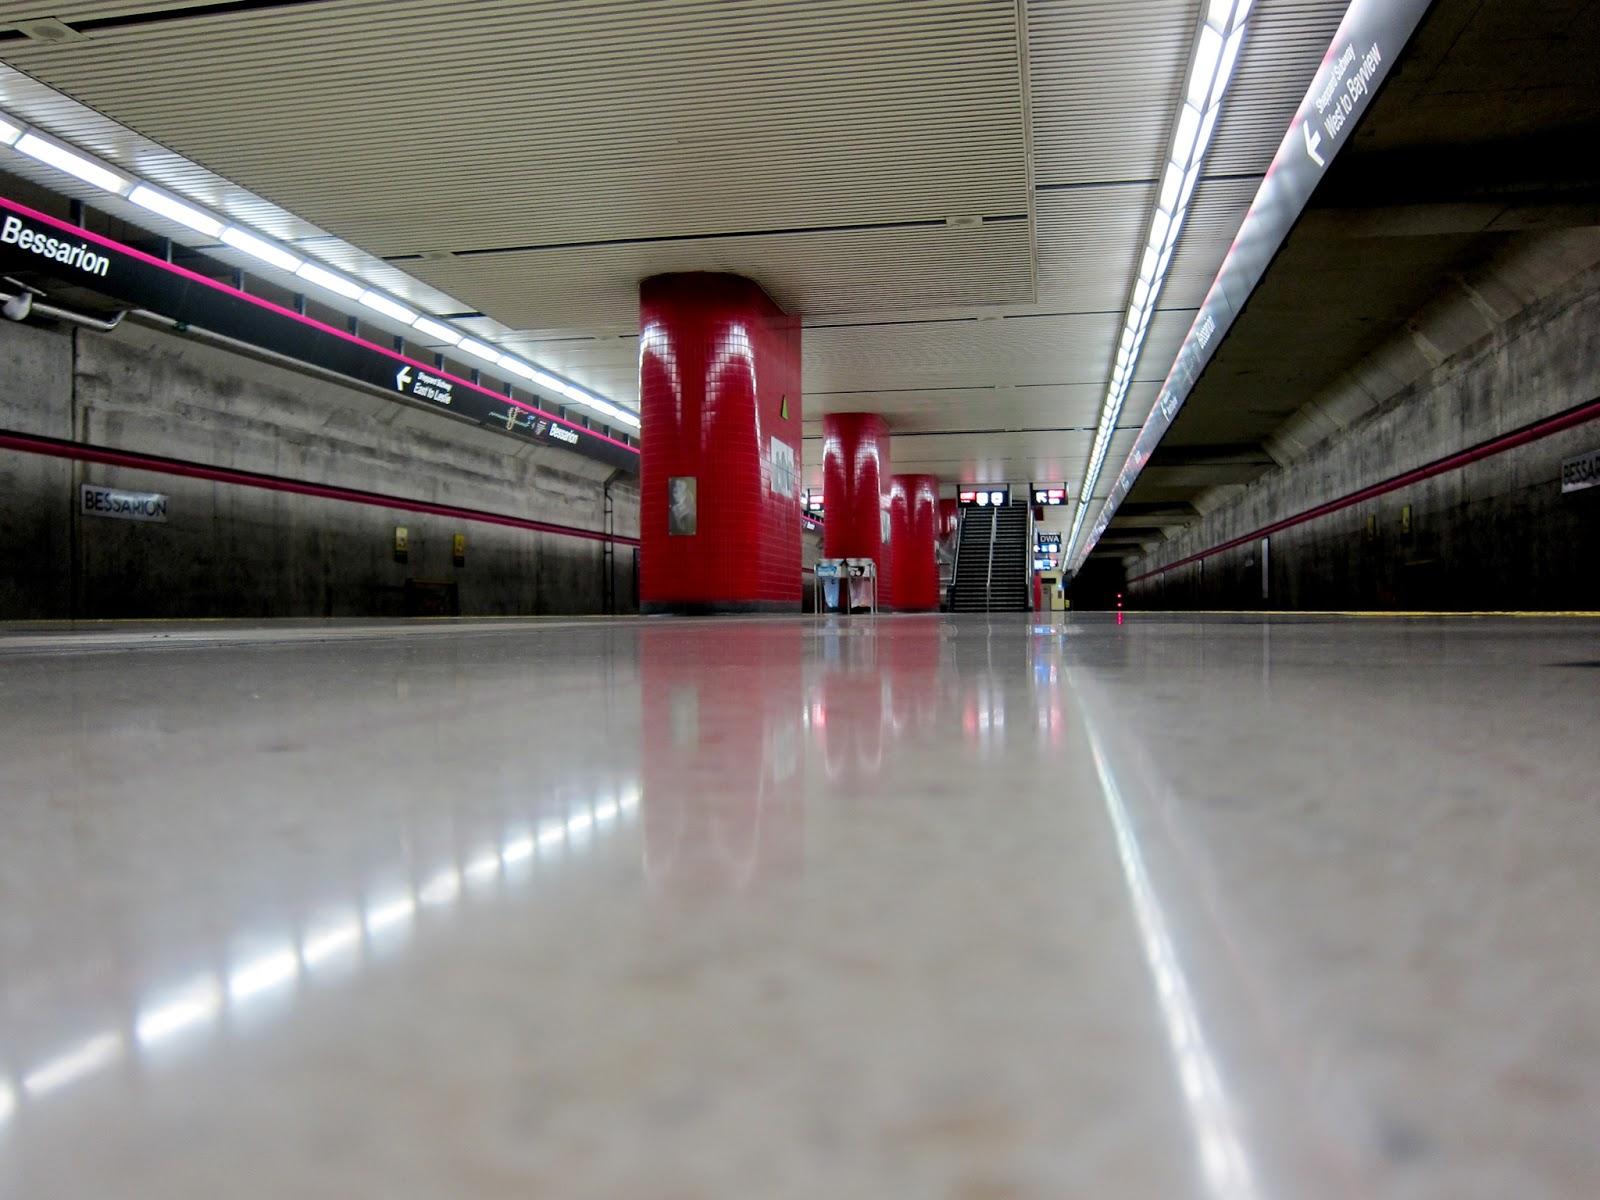 Bessarion station platform